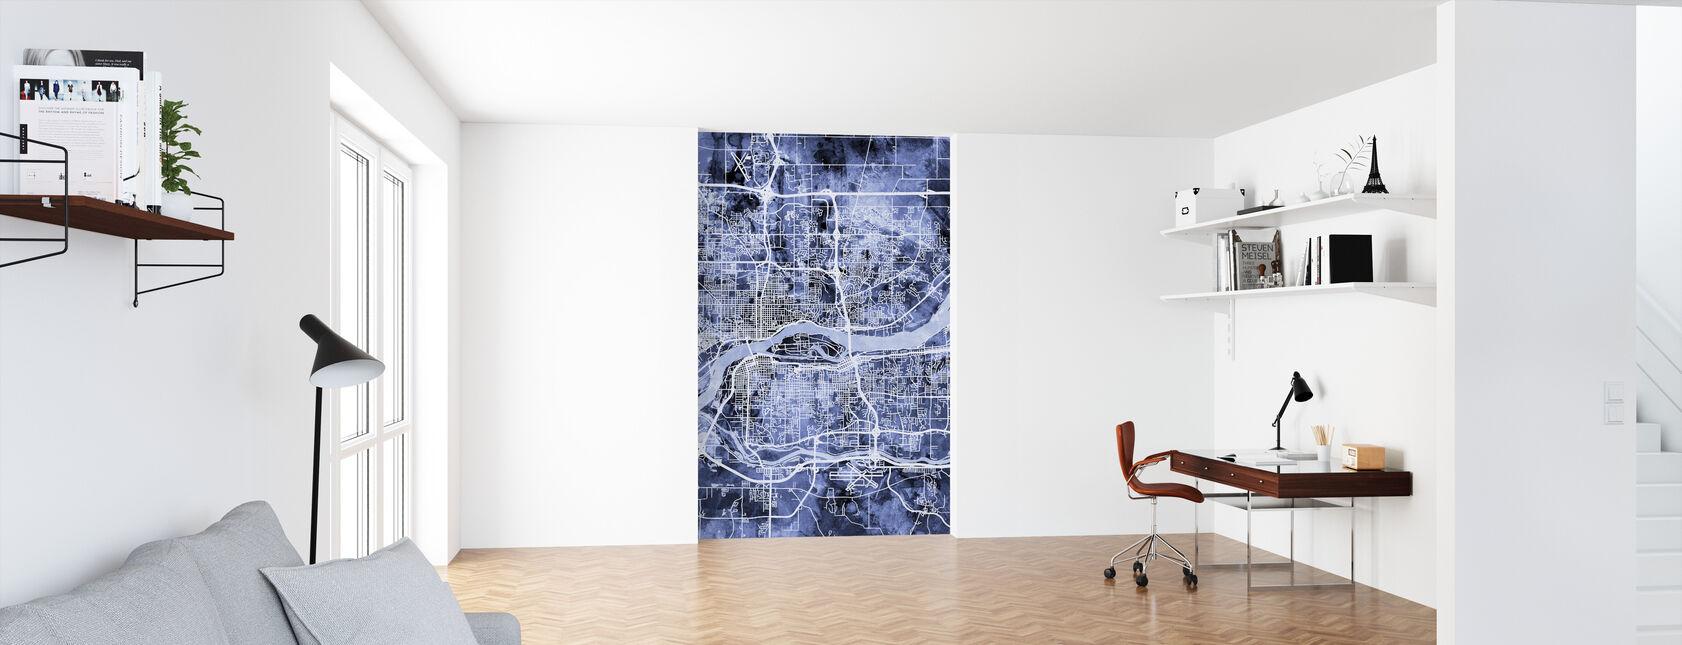 Quad Cities Street Map - Wallpaper - Office